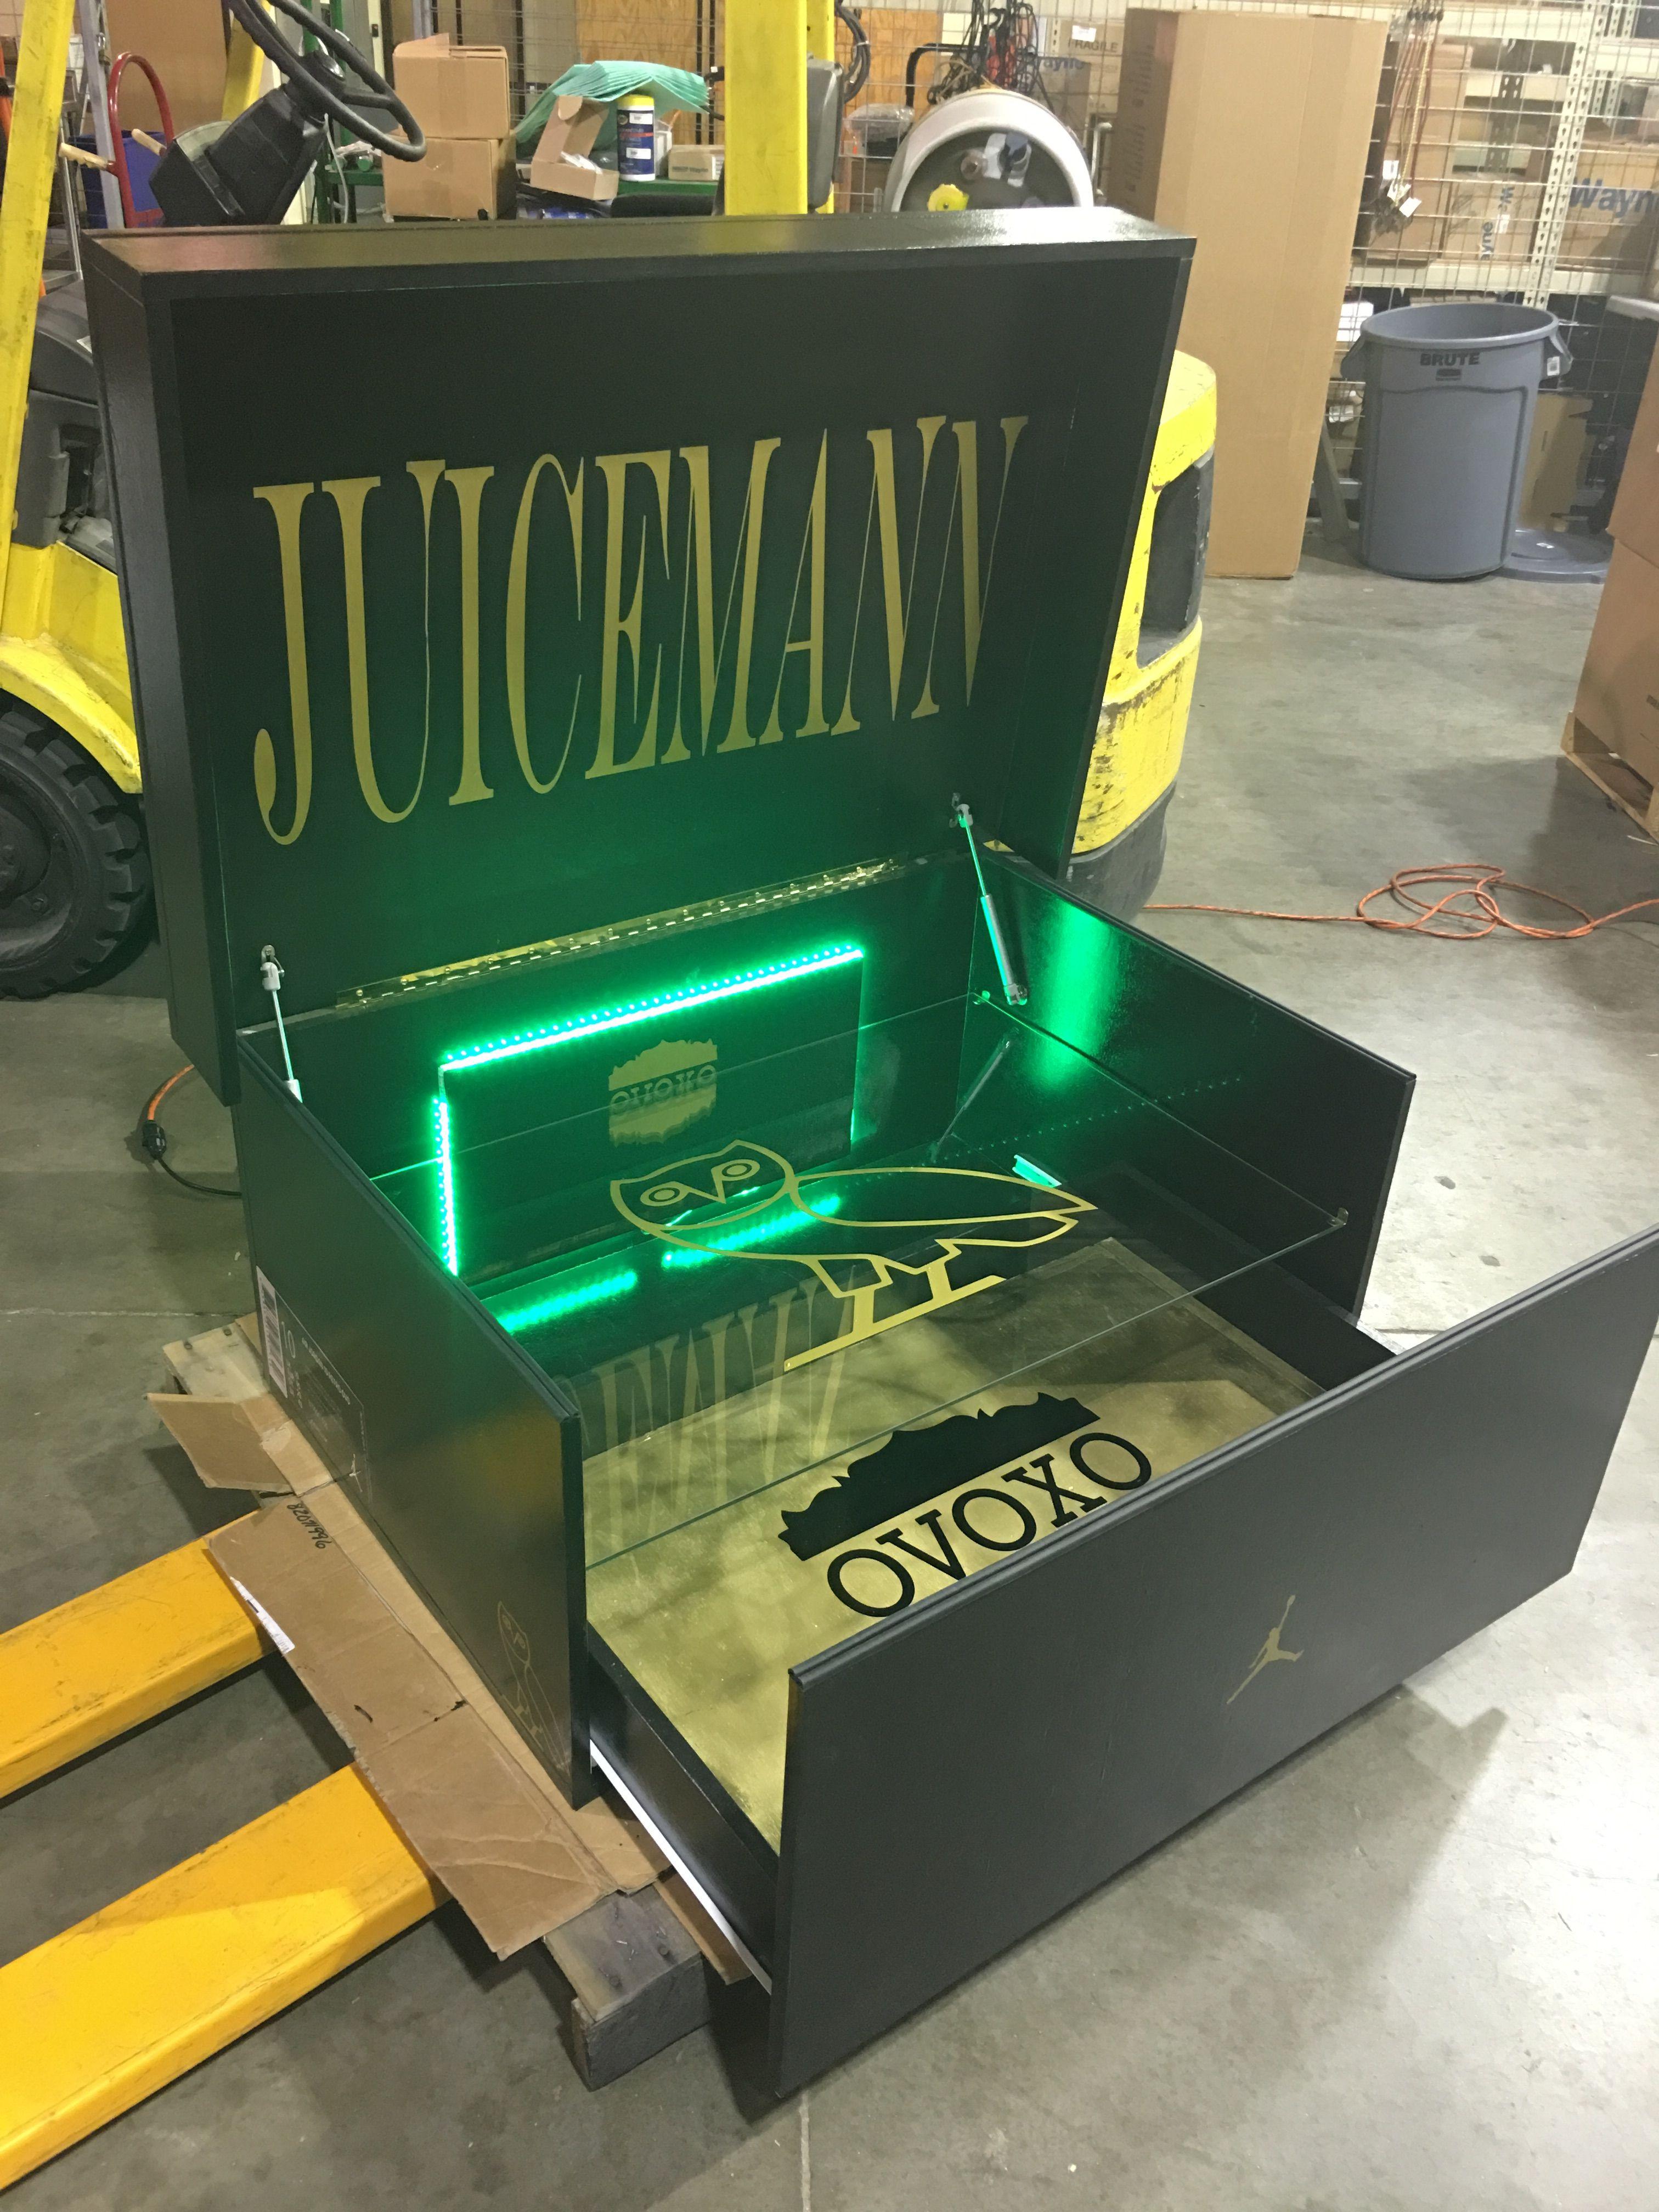 Black and Gold OVO Edition Giant Air Jordan Shoebox Storage!  www.sneakerheadshoebox.com d5bb2a11798f